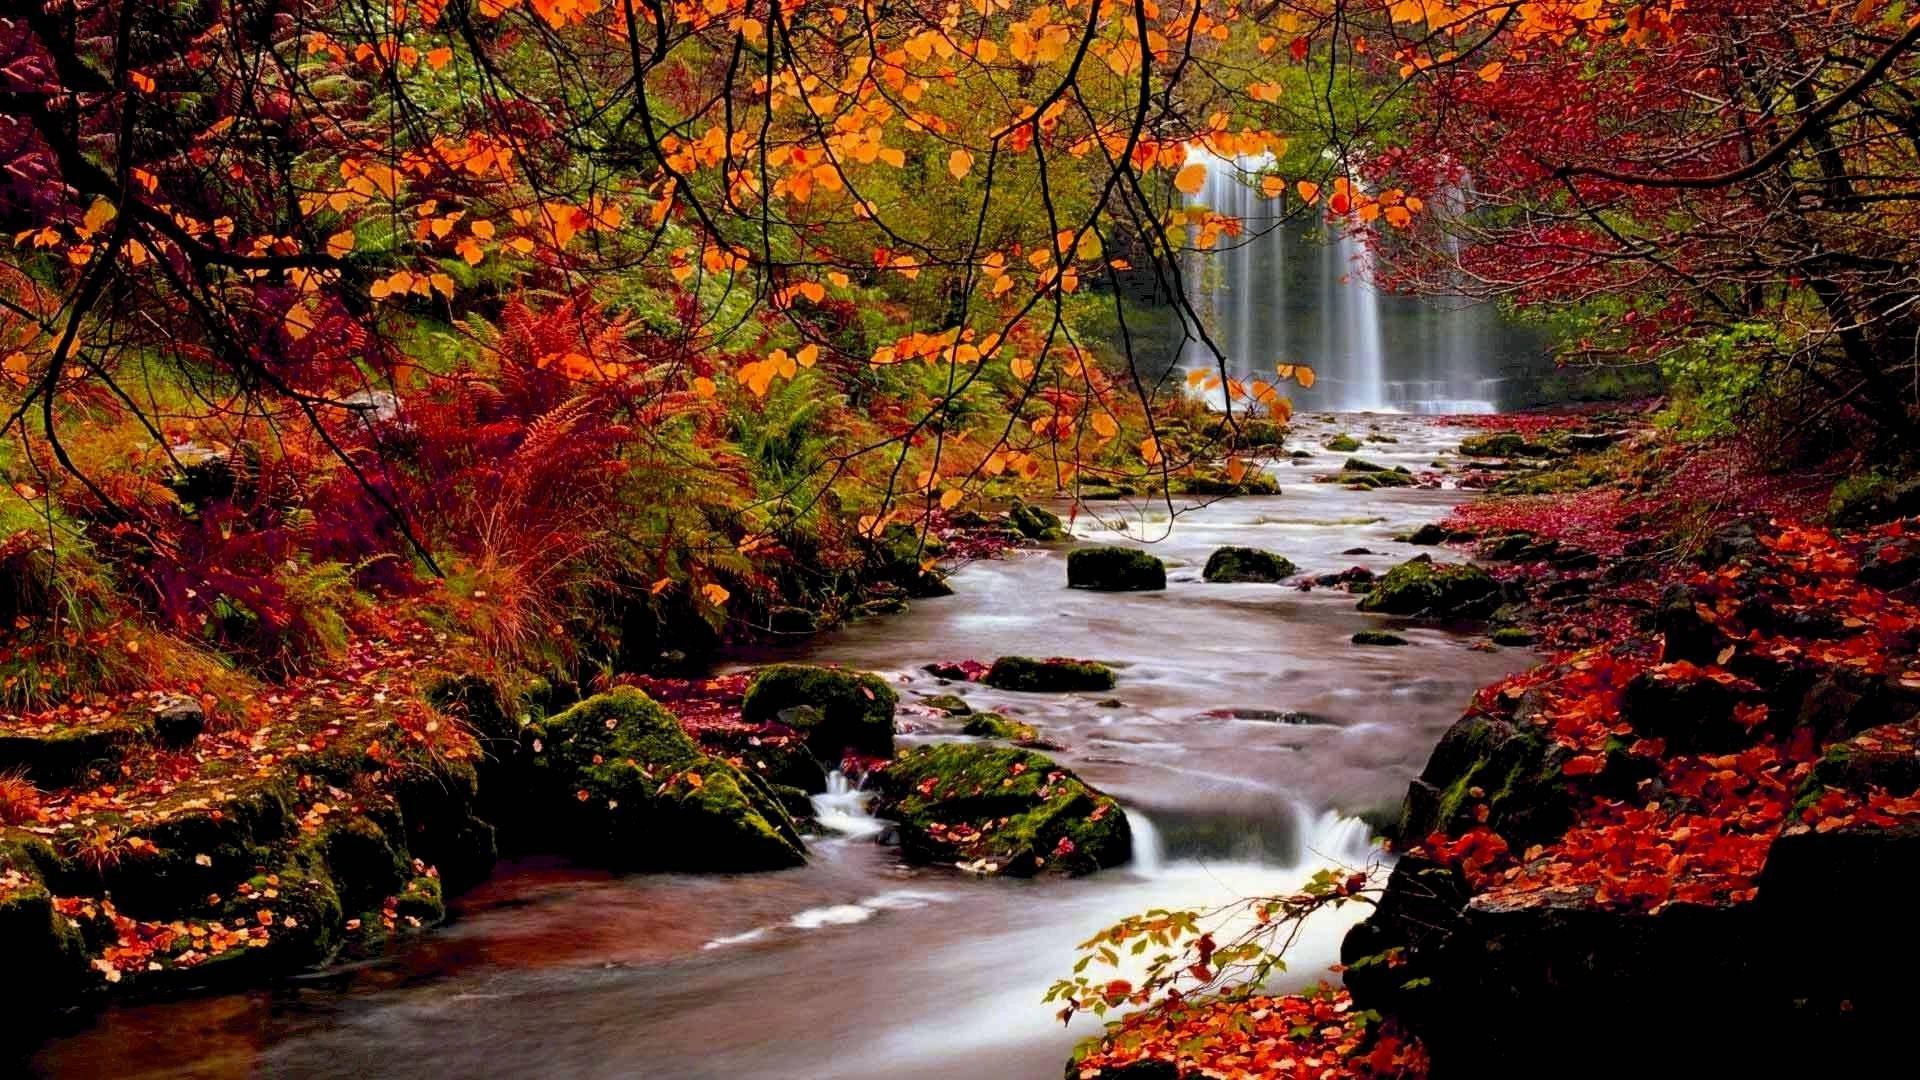 Desktop Wallpaper Fall Leaves Fall Scenery Wallpapers 183 ①